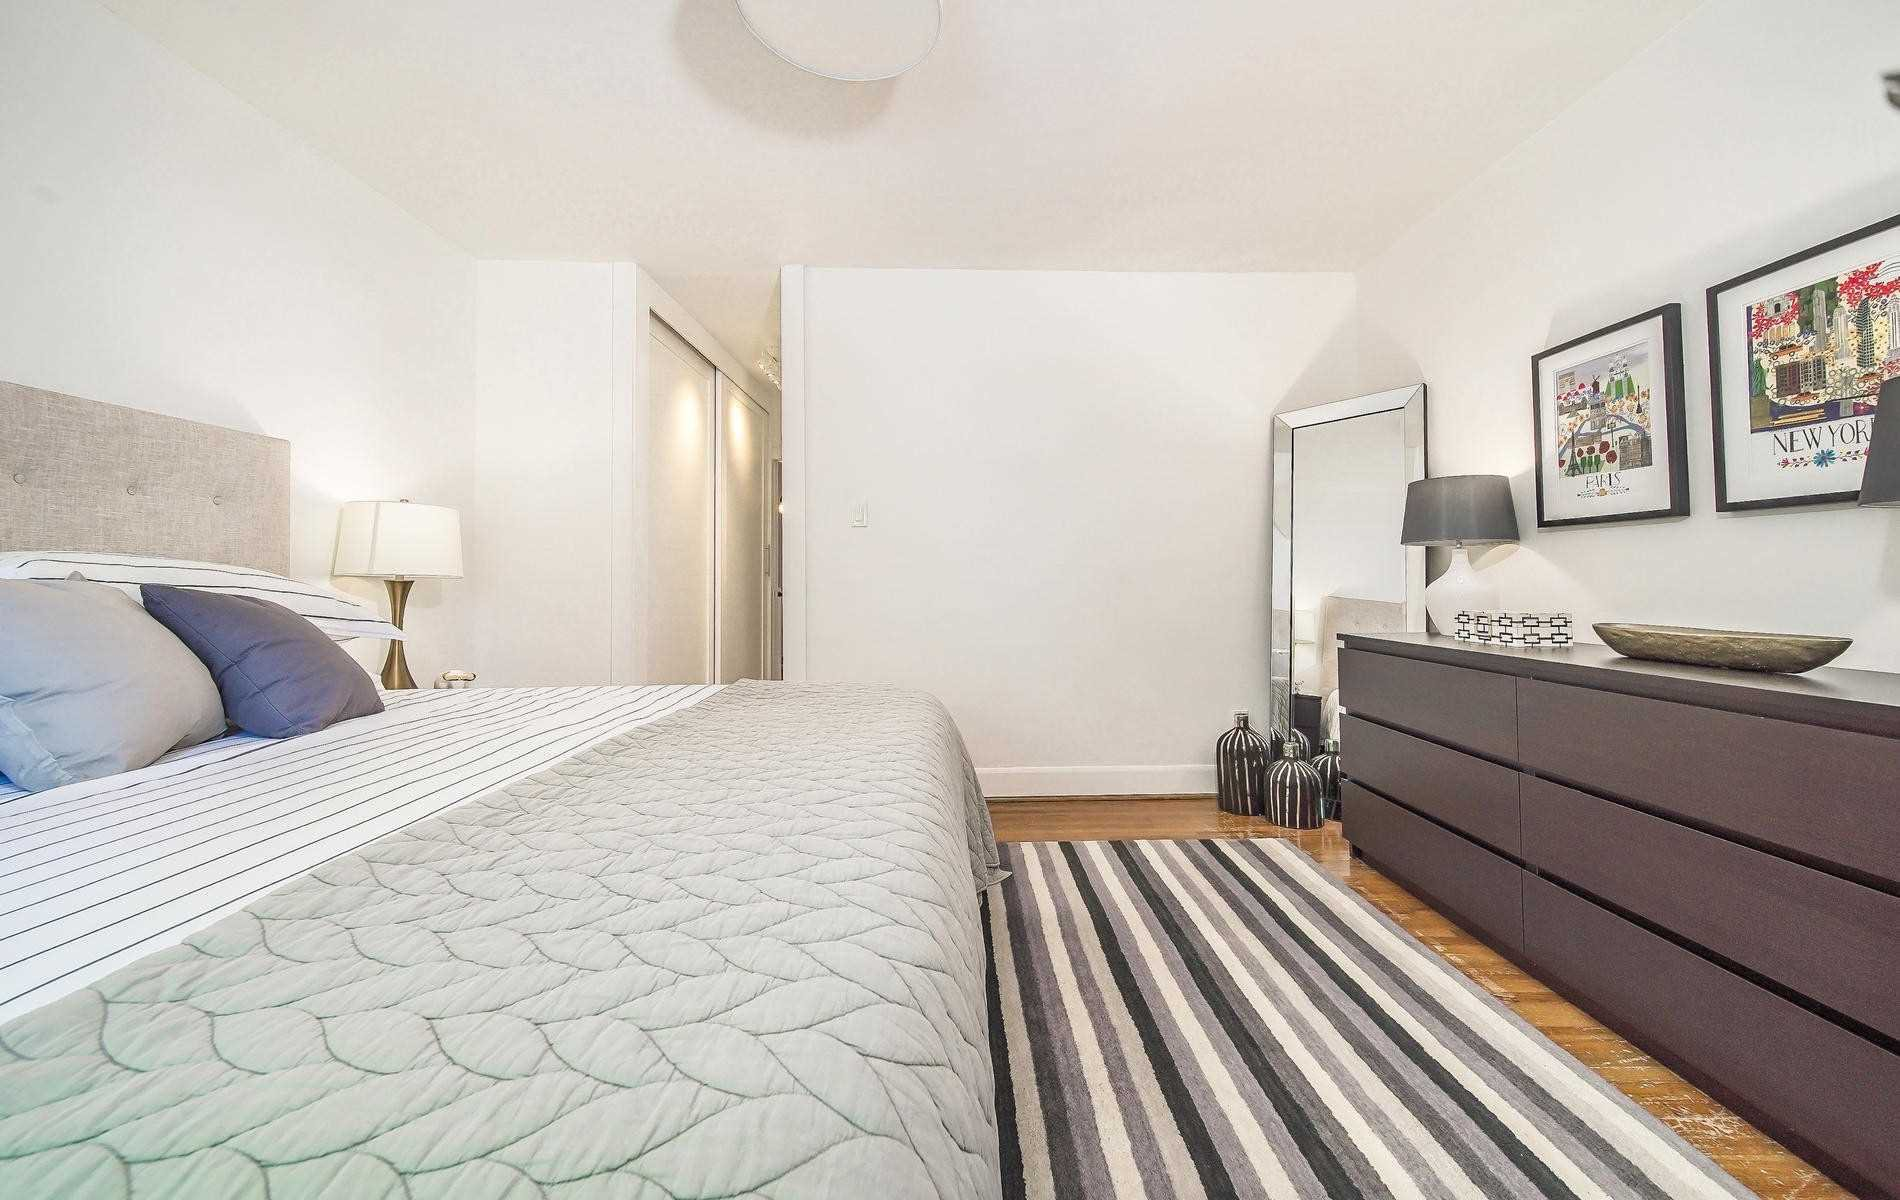 Photo 16: Photos: 64 Larchmount Avenue in Toronto: South Riverdale House (2-Storey) for sale (Toronto E01)  : MLS®# E4489752